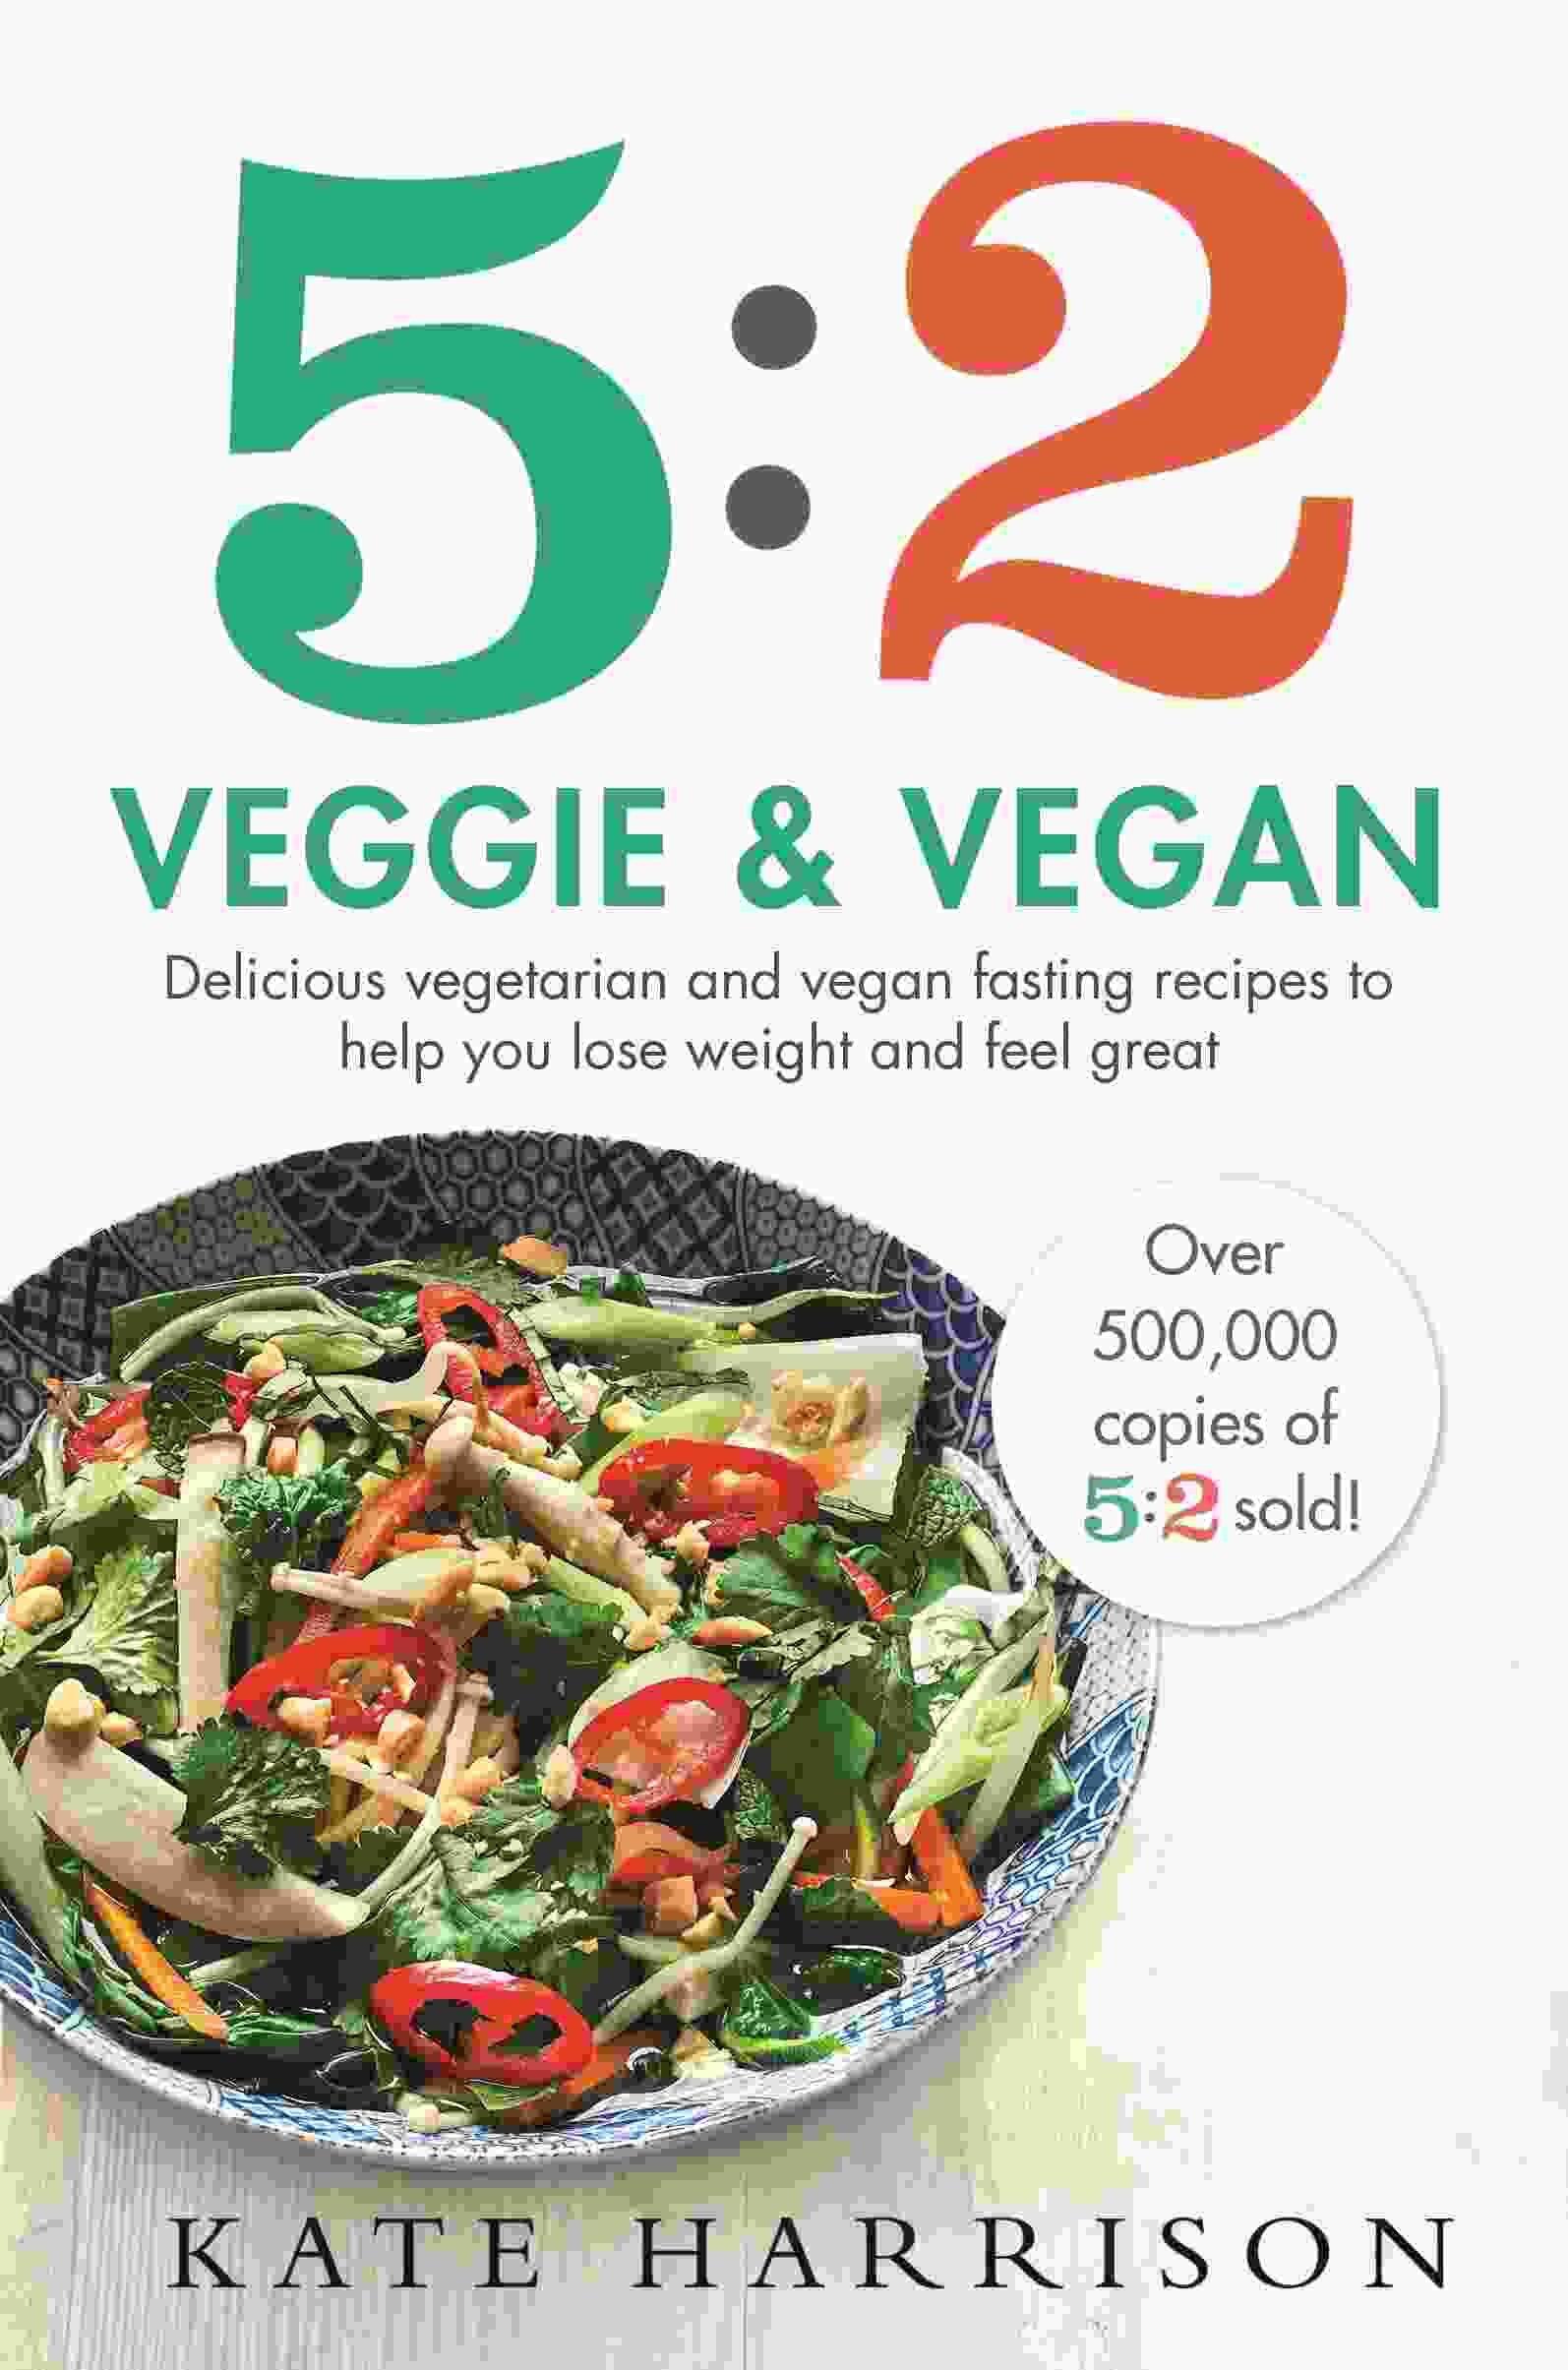 5.2-Veggie-Vegan-thumbnail-final-Kate-Harrison-3.jpg (Copy)